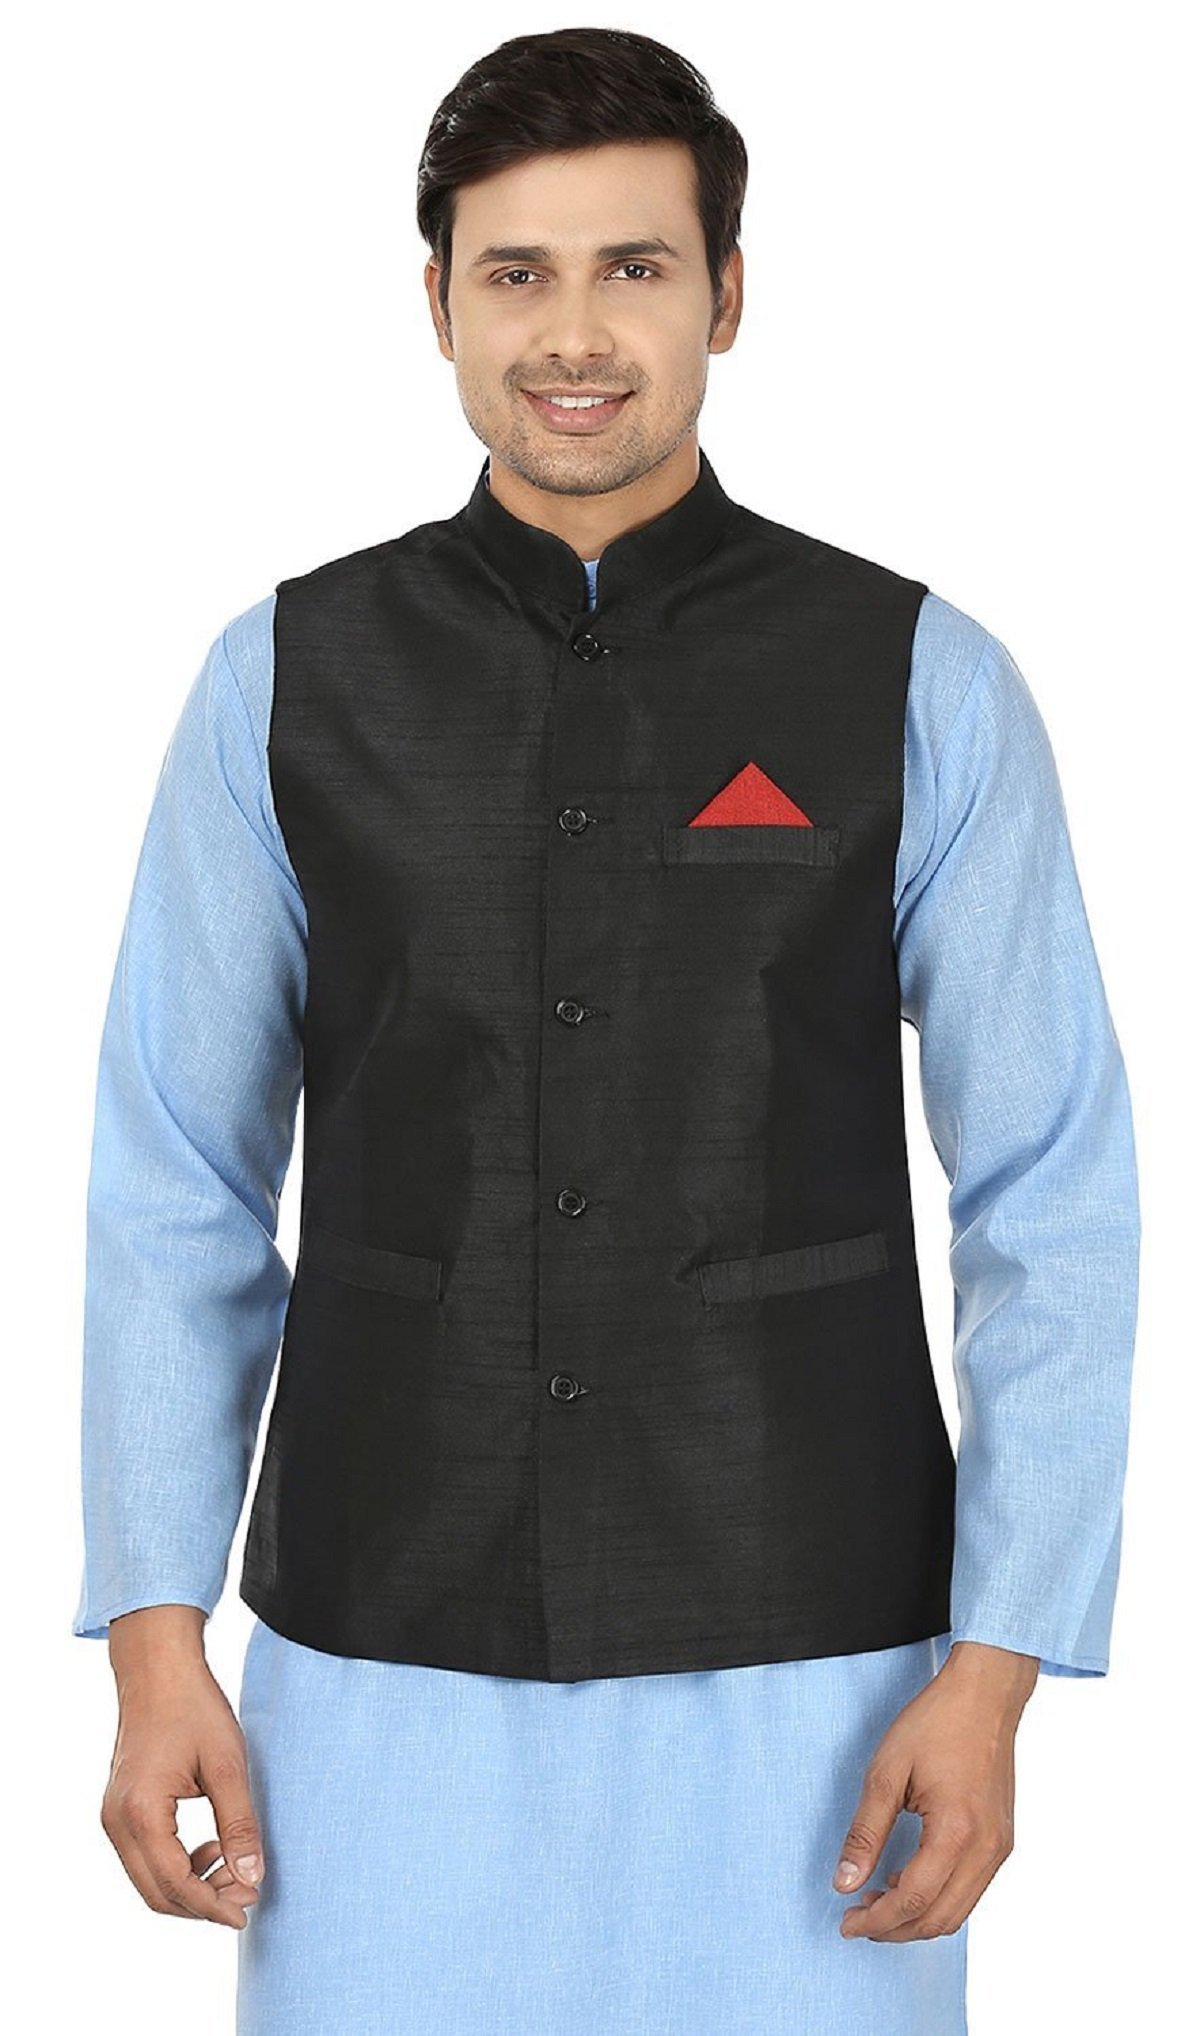 Royal Kurta Men's Traditonal Silk Blended Nehru Waistcoat Jacket 38 Black